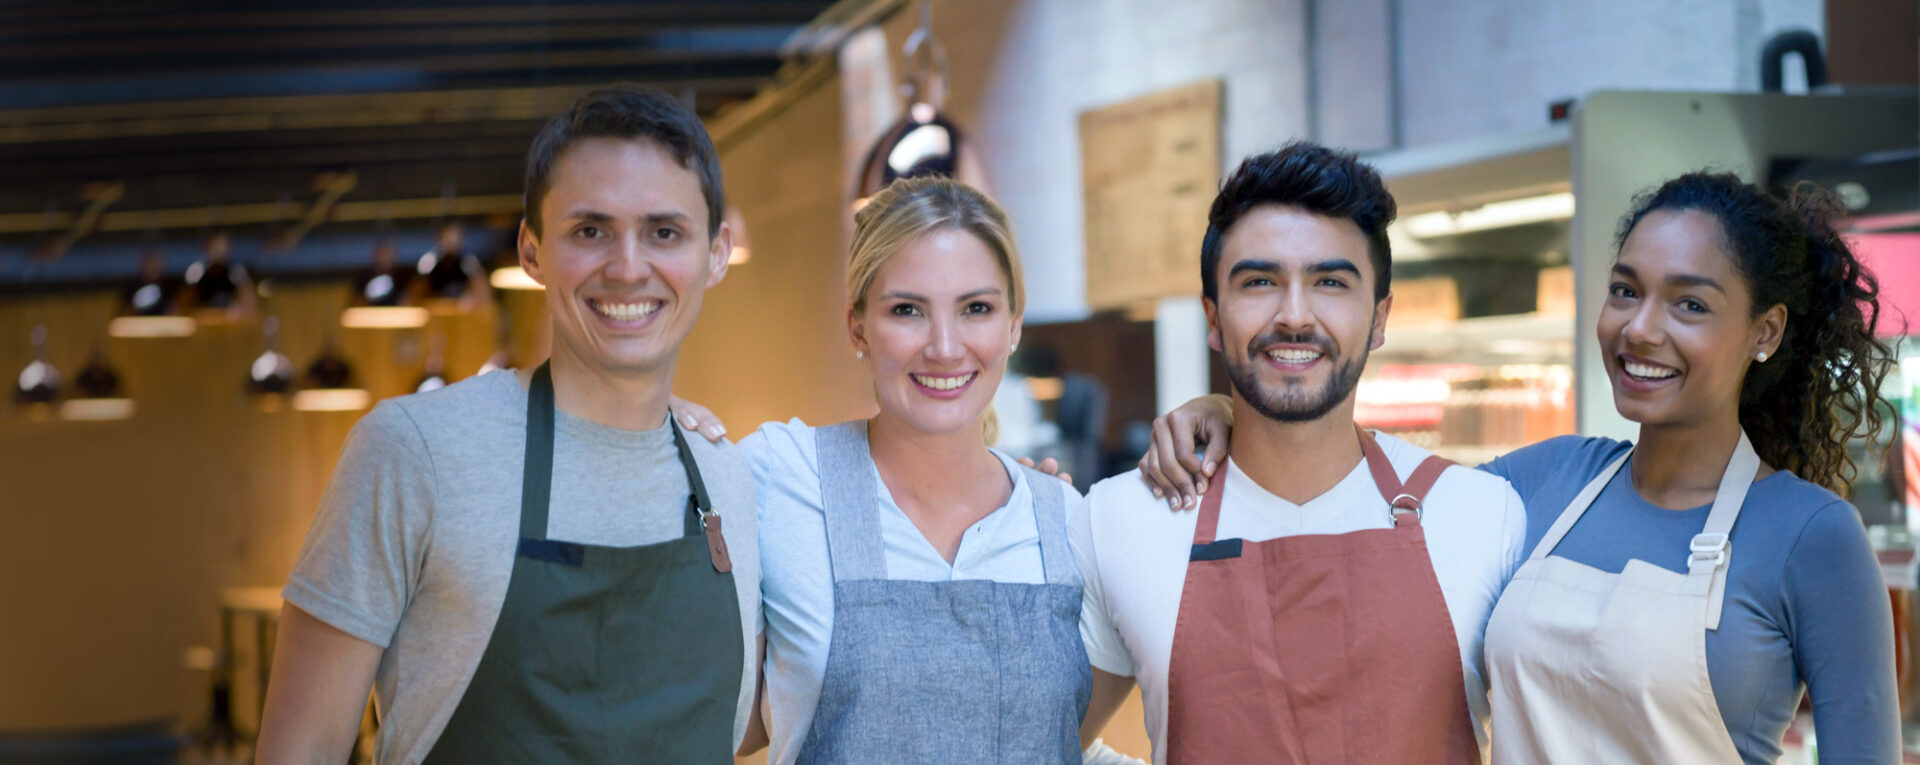 Internal marketing restaurant operators